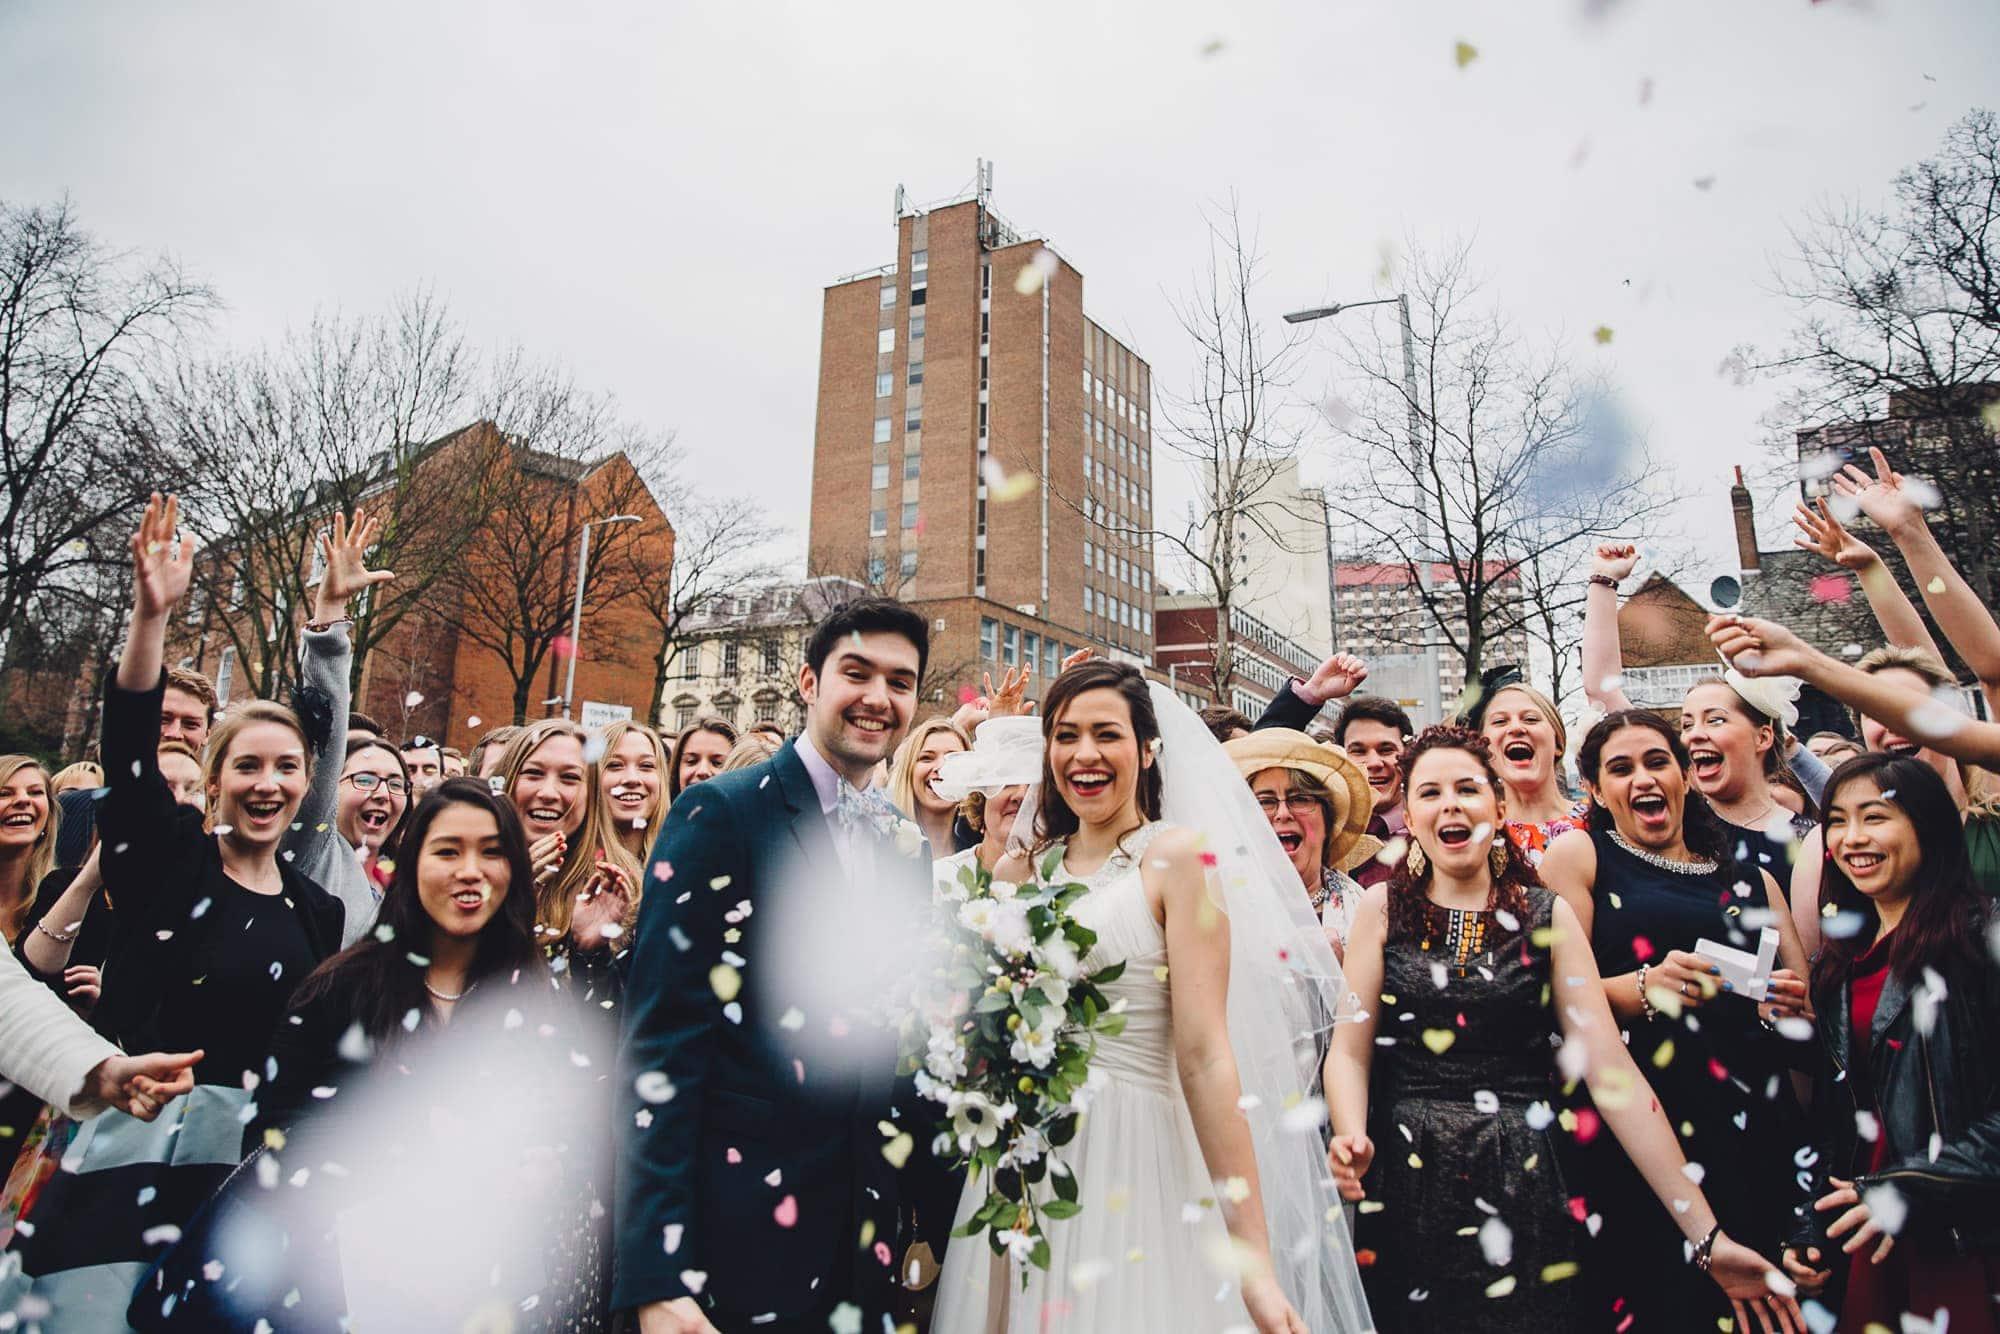 Matlt-Cross-Nottingham-wedding-Photography-37